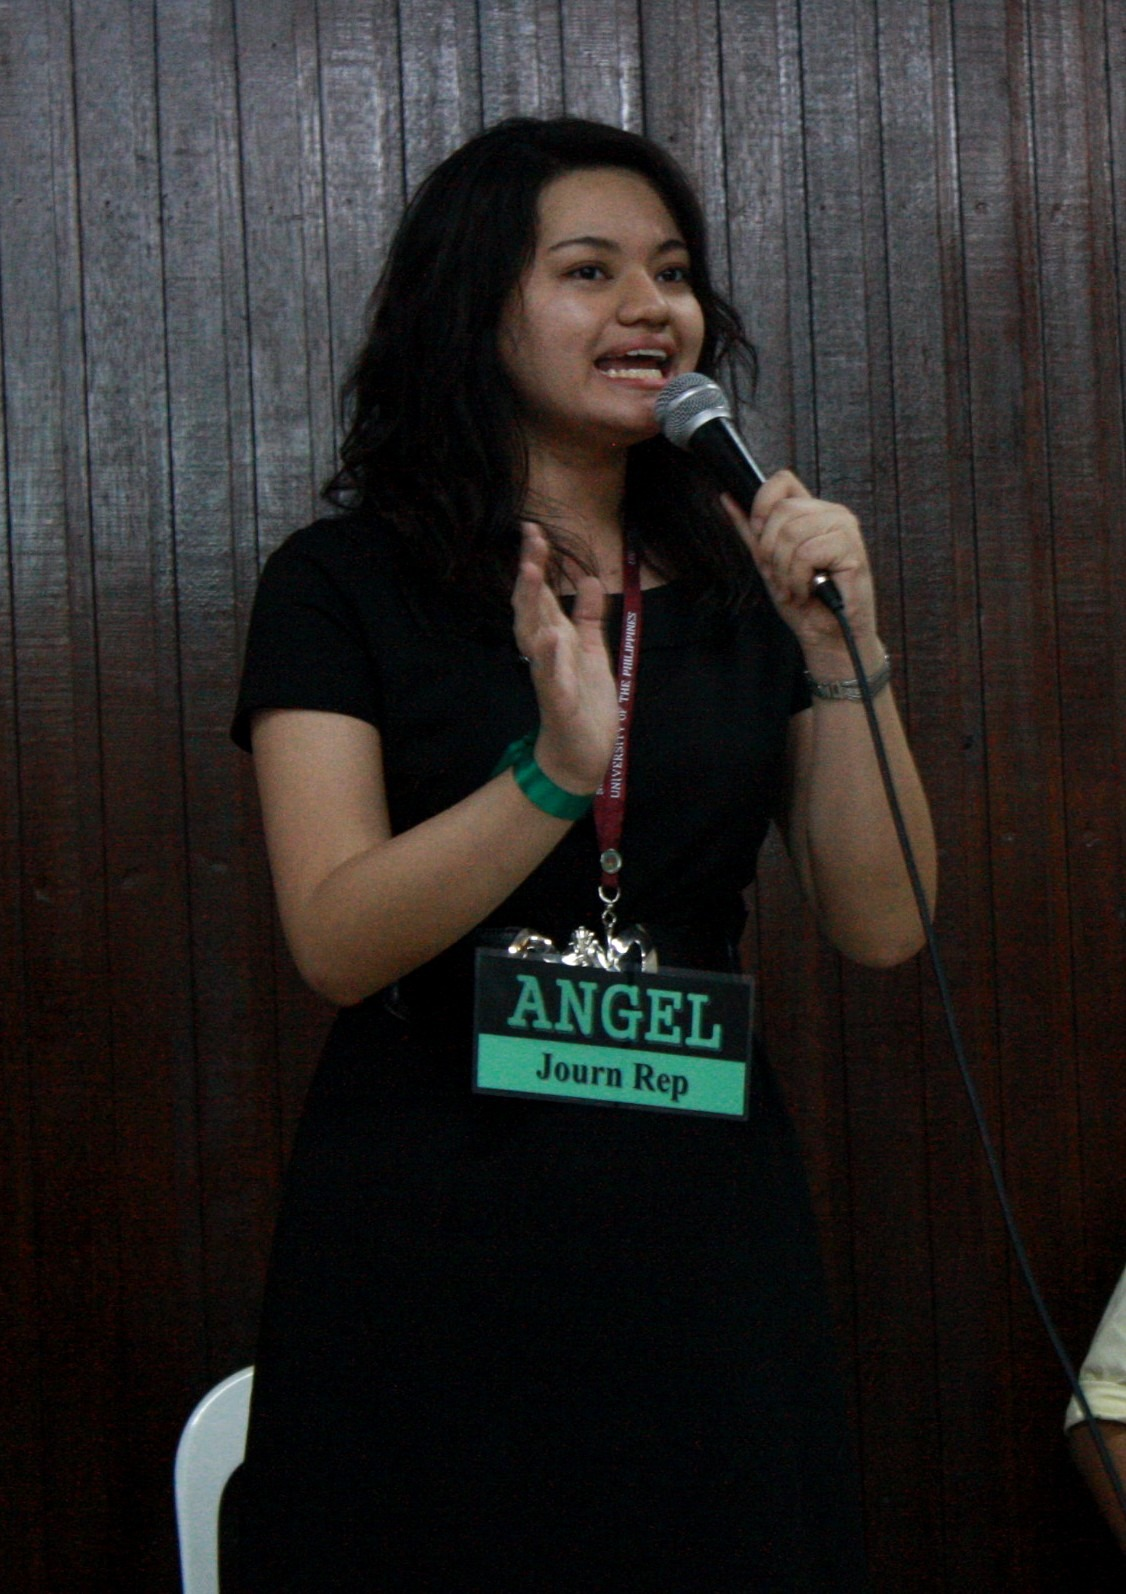 Militant vs. alternative: local CMC candidates argue on activism